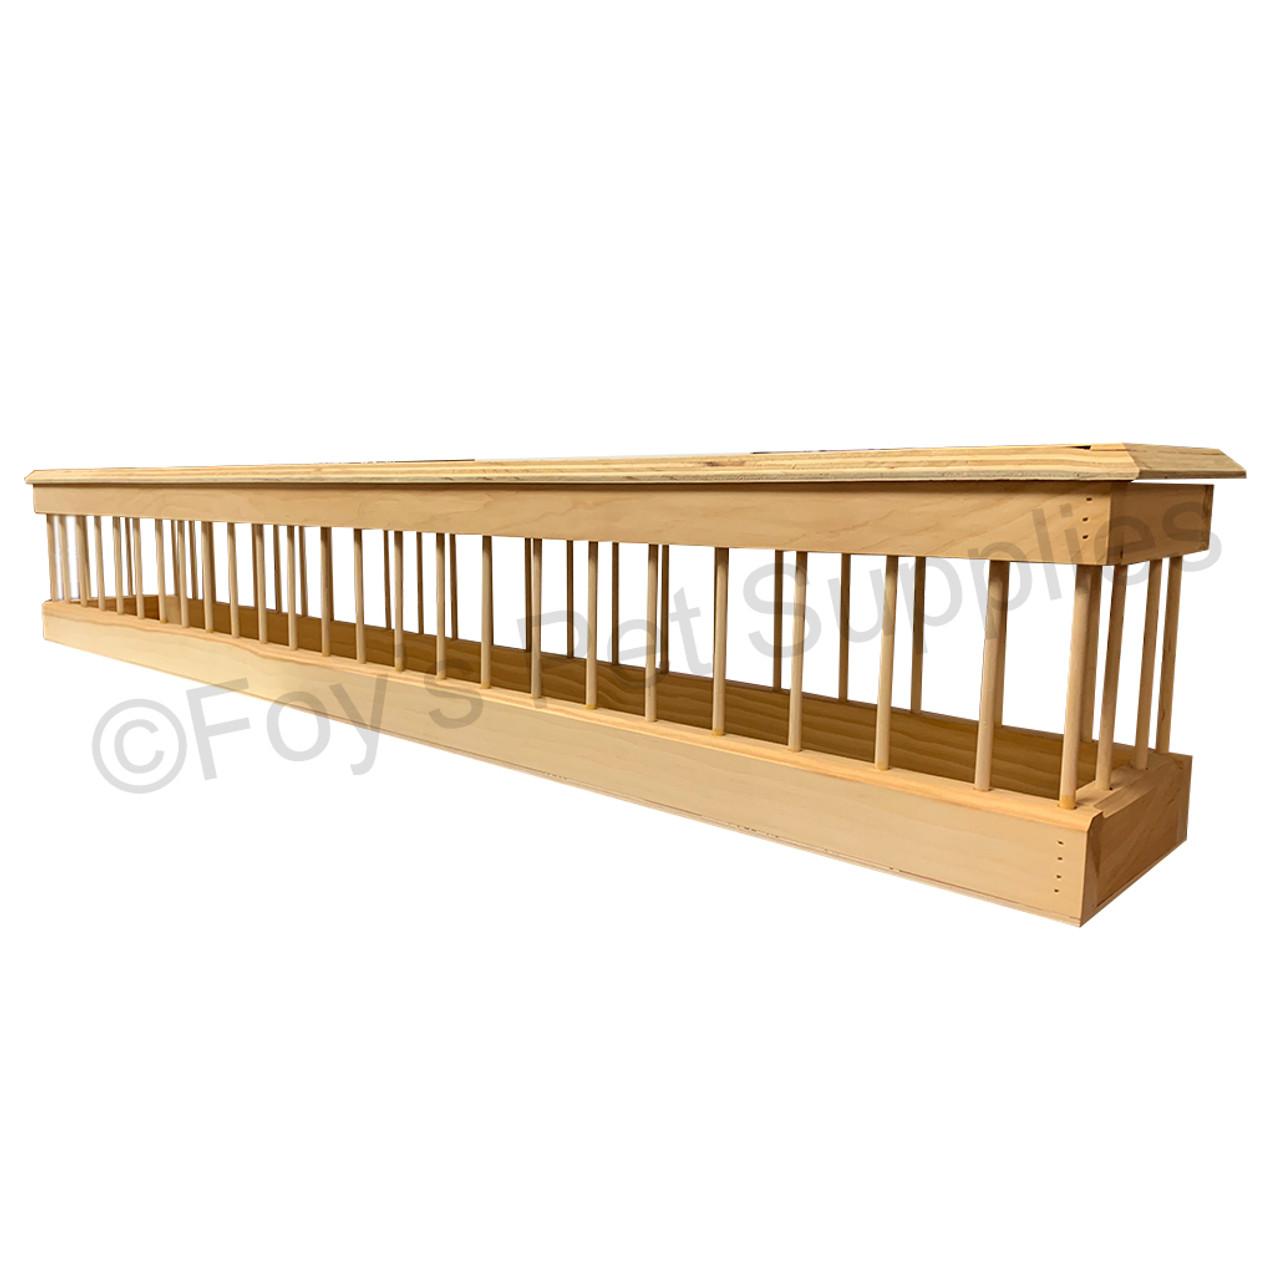 48 inch Sanitary Wood Feeder